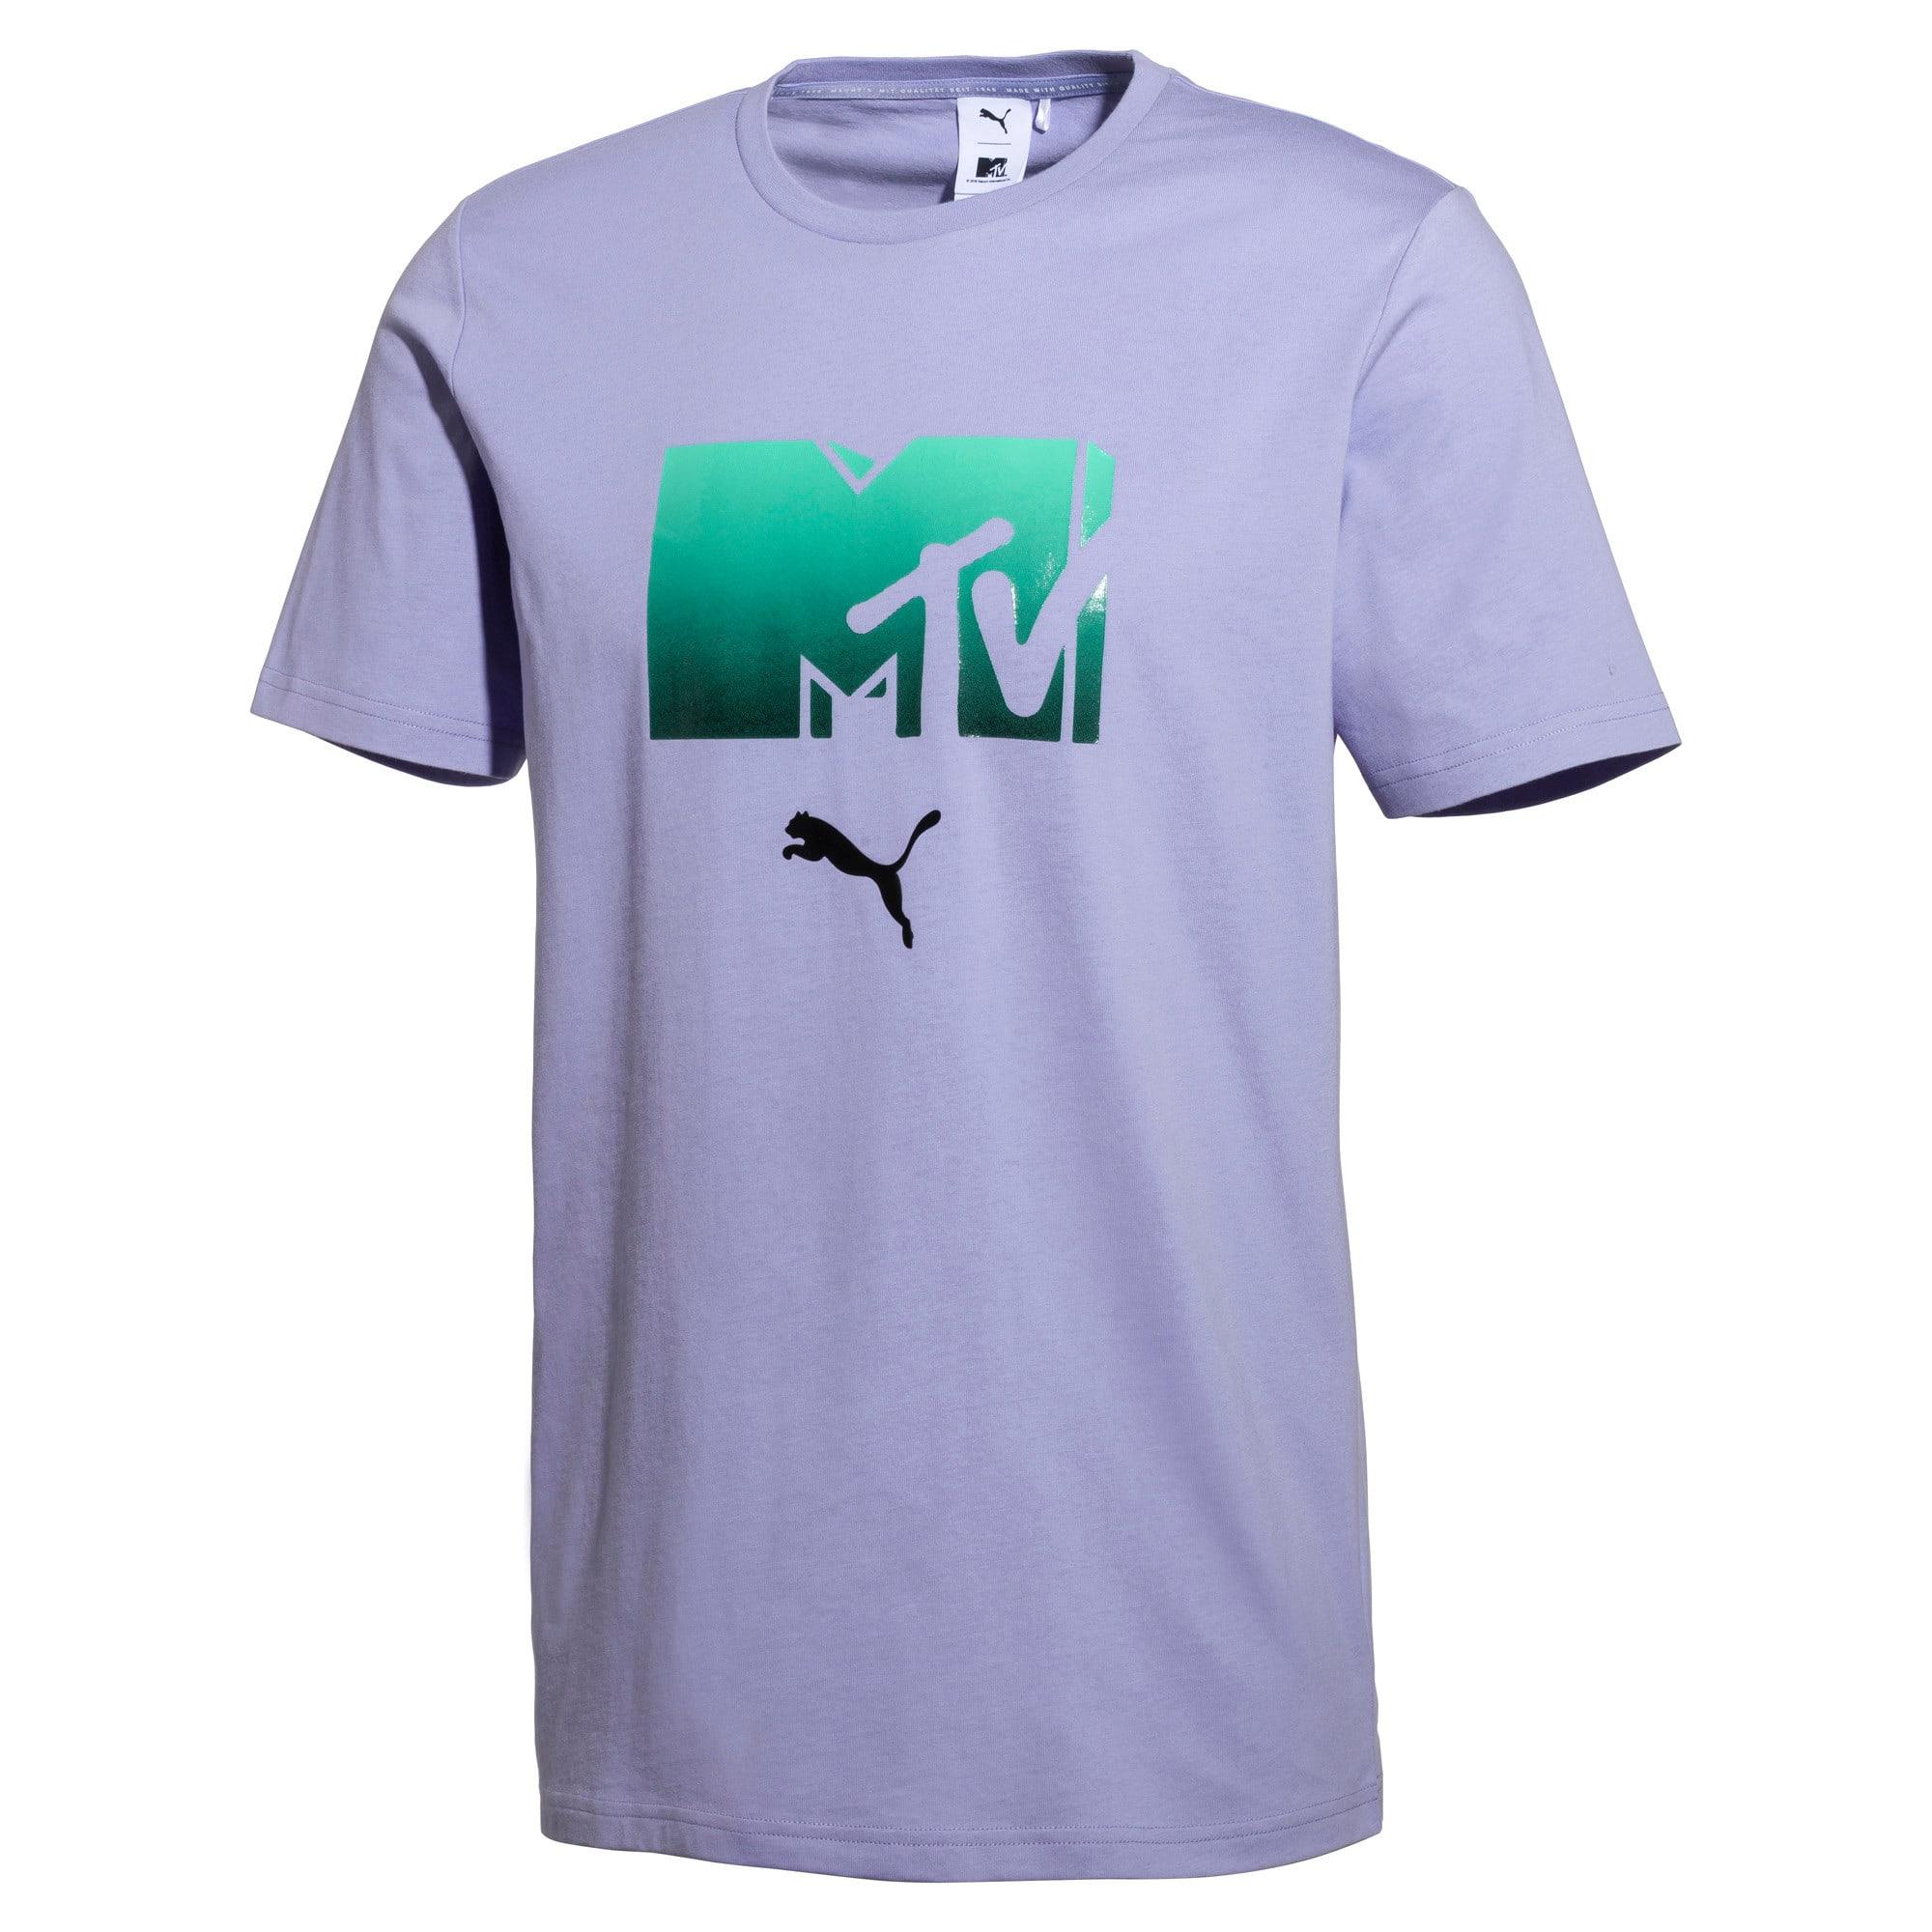 Miniatura 1 de Camiseta PUMA x MTV para hombre, Sweet Lavender, mediano